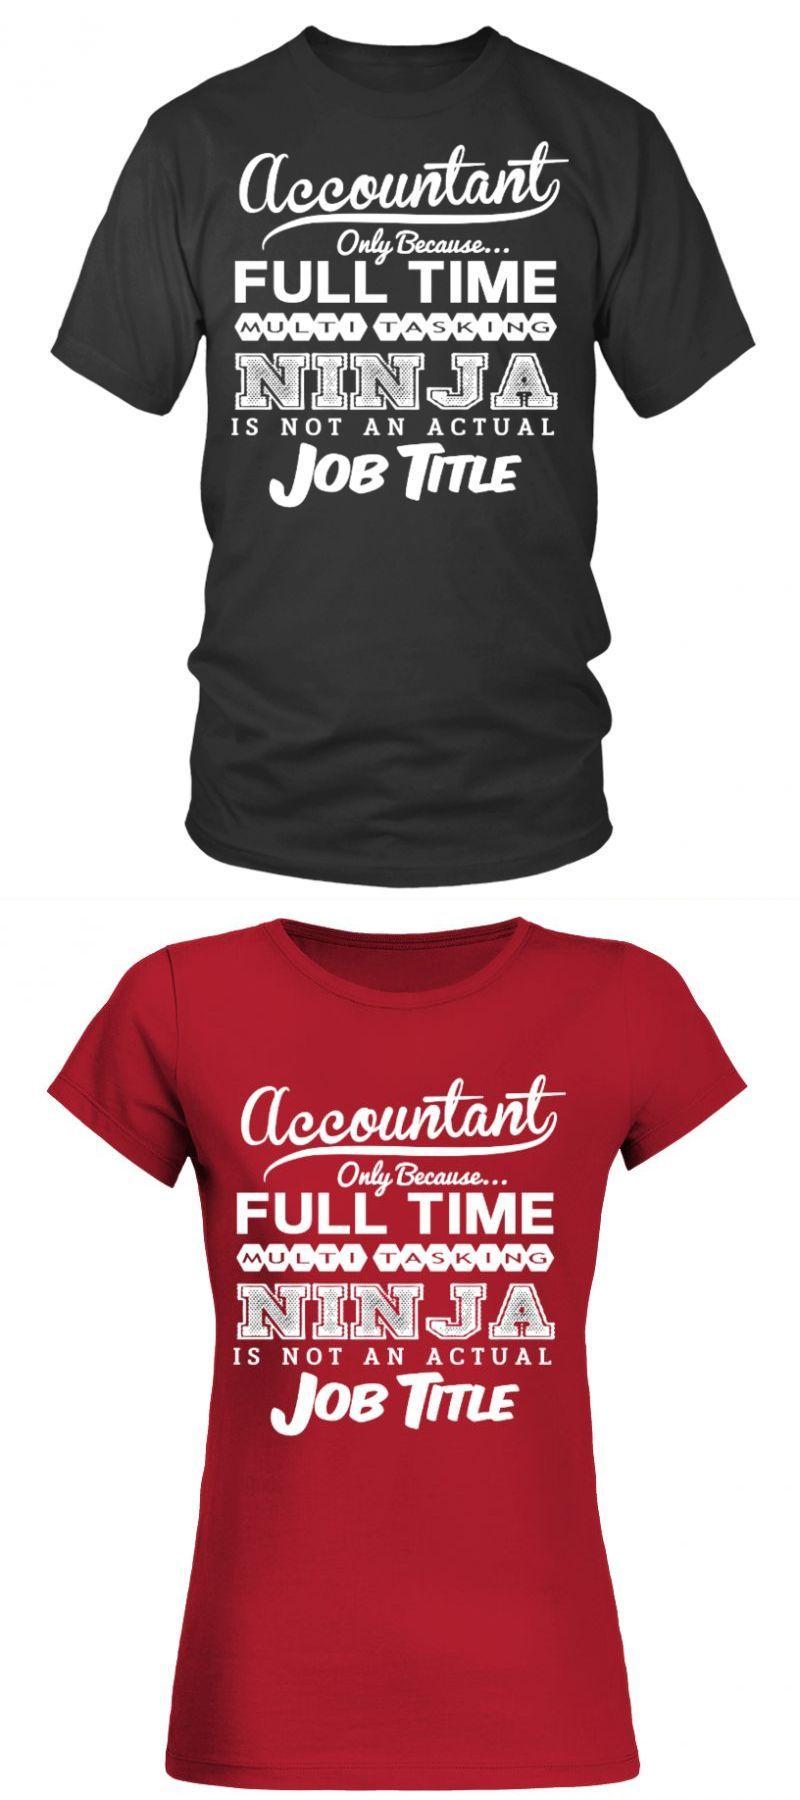 Halloween T Shirt Ideas Diy.Halloween T Shirt Ideas Accountant Ninja Halloween Shirt